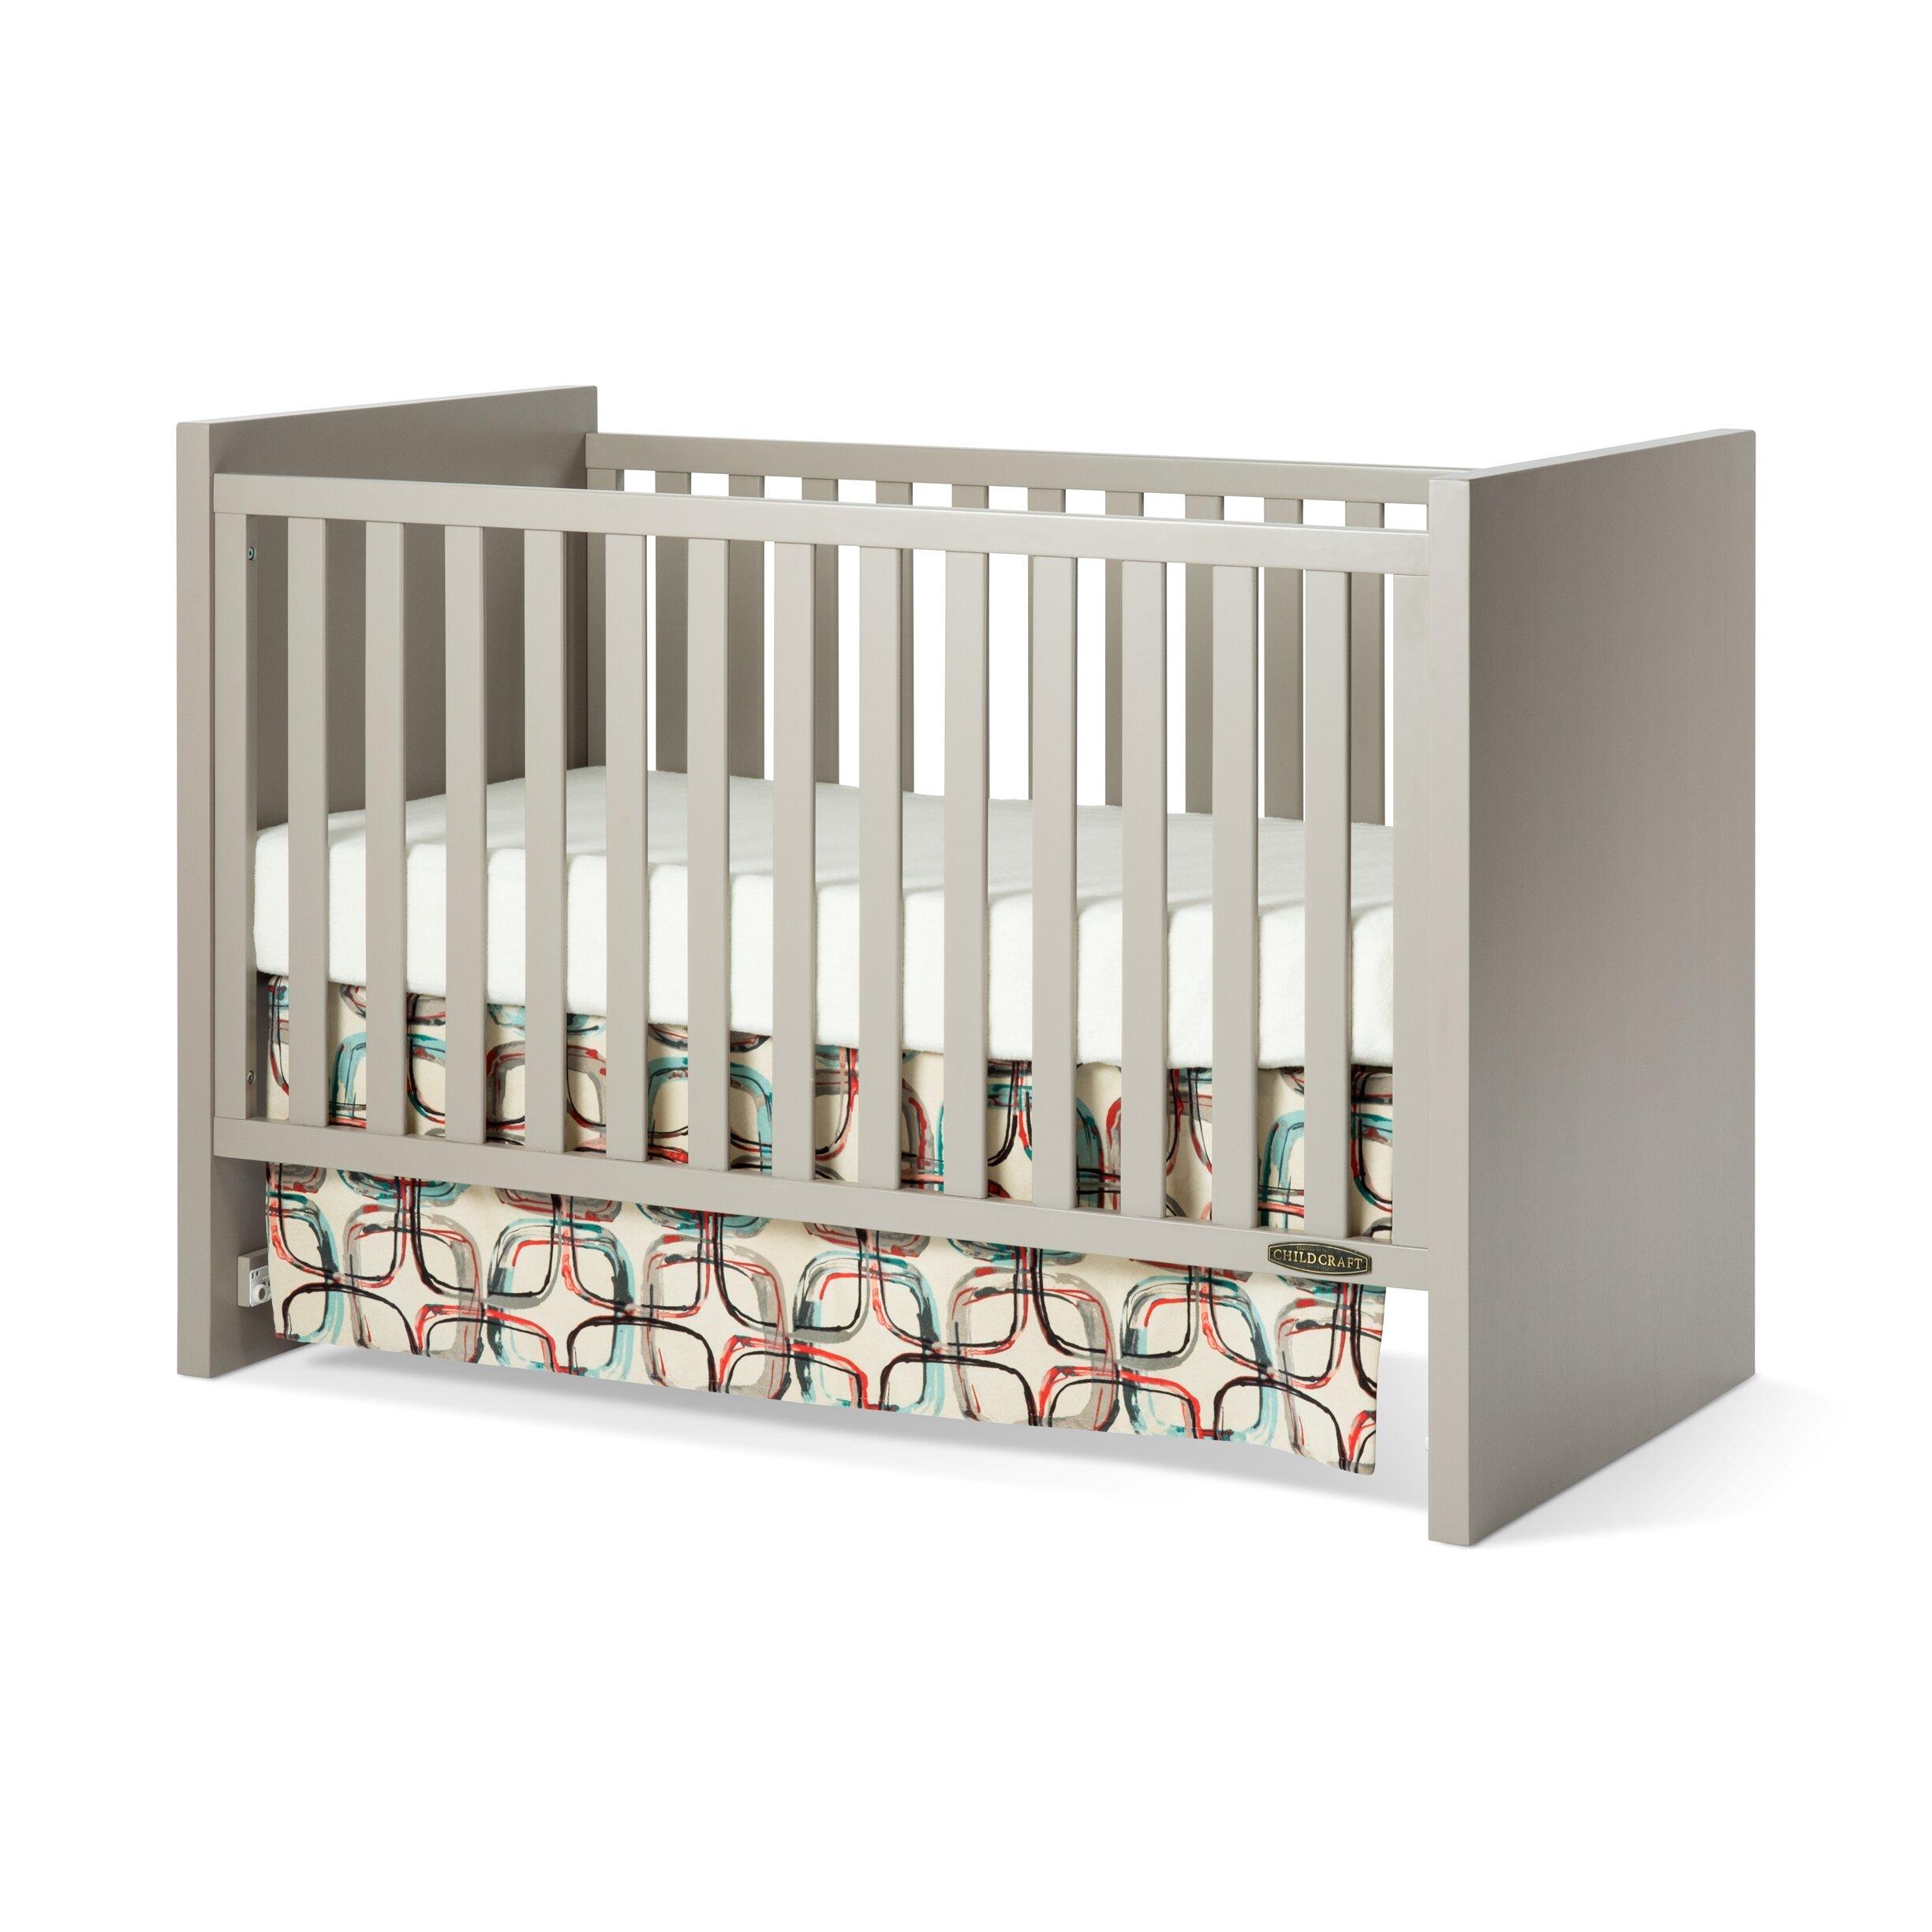 Crib for sale sheffield - Loft 3 In 1 Convertible Crib